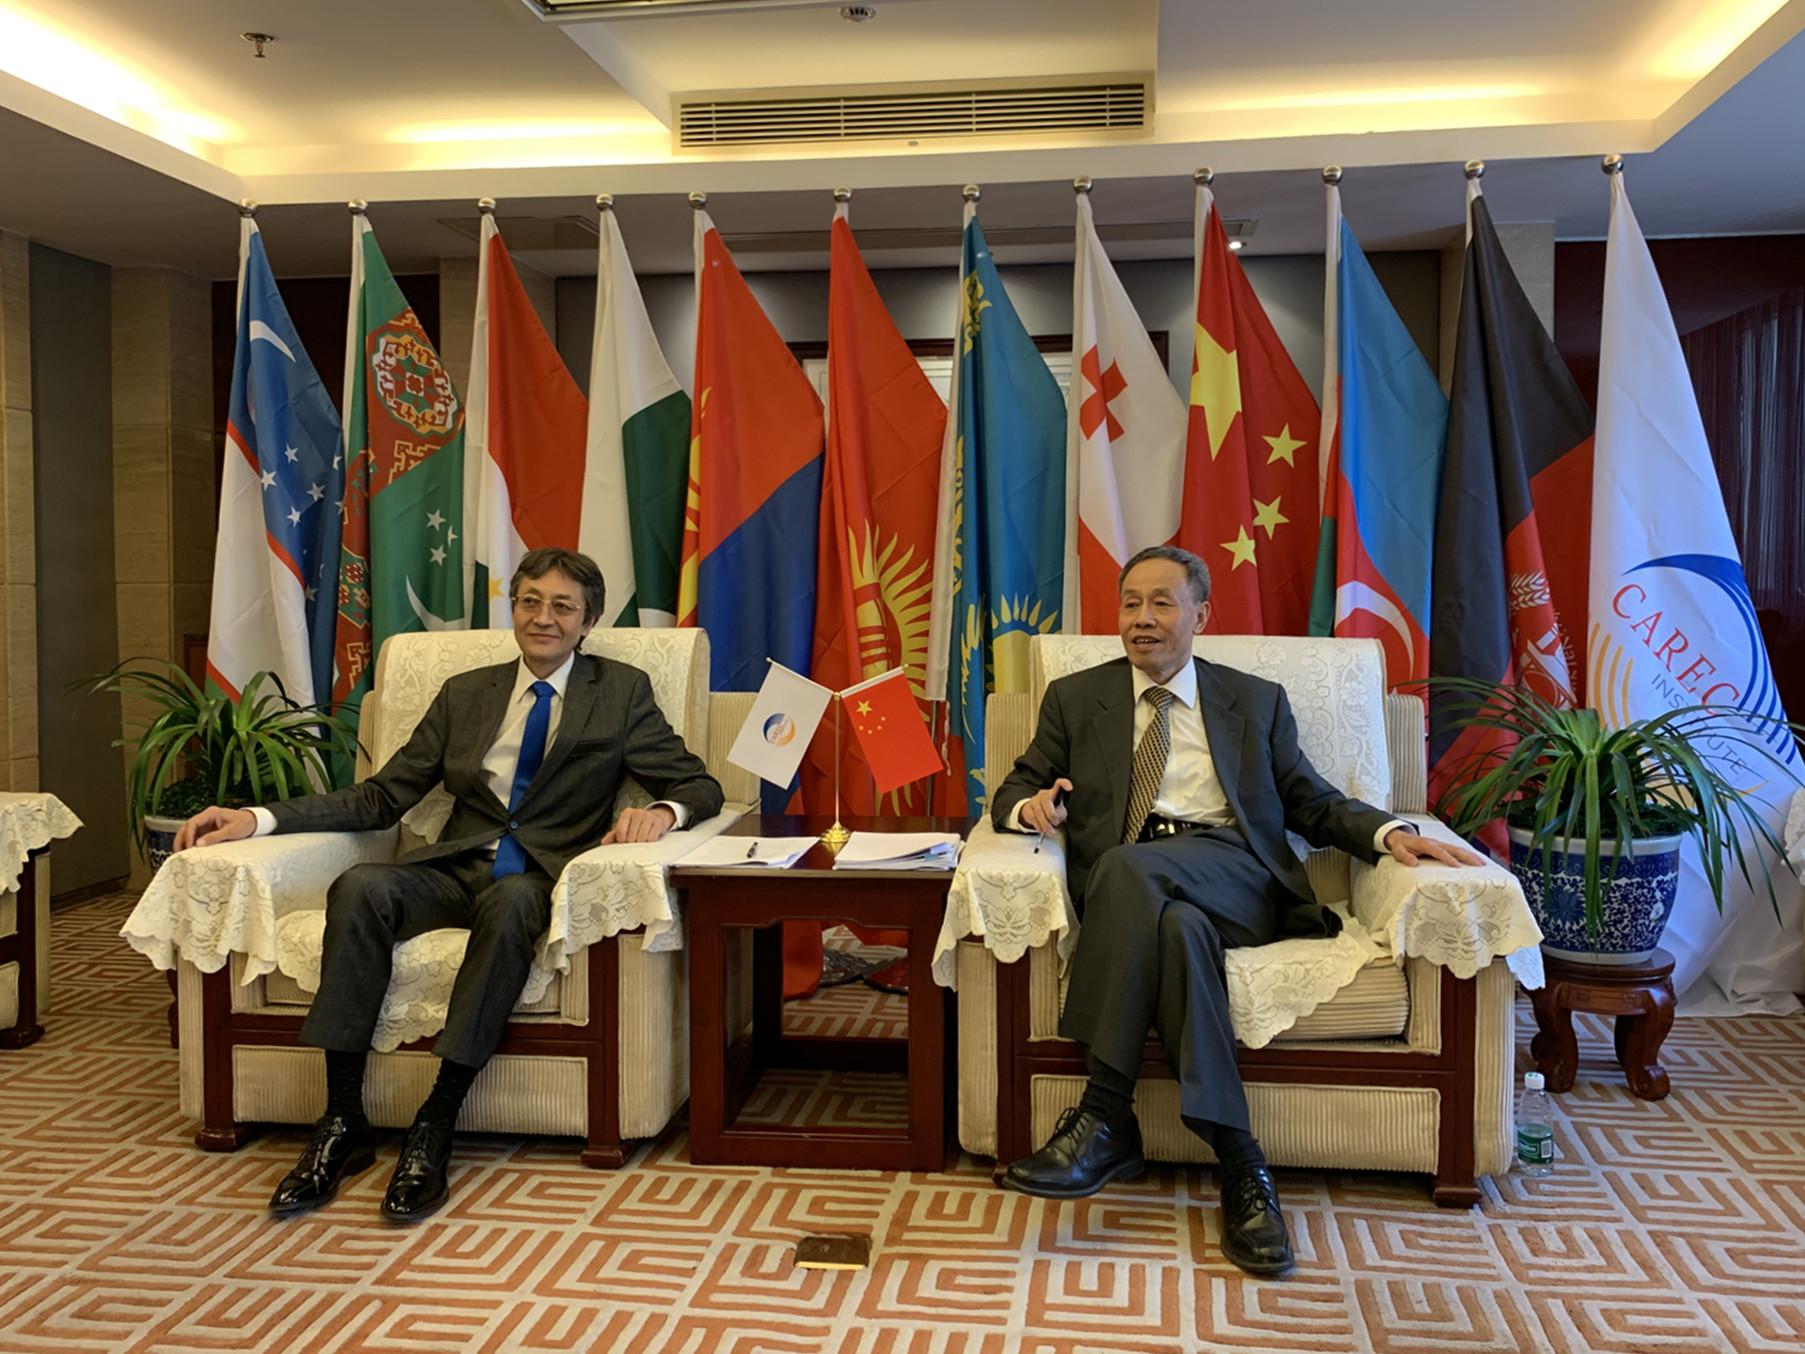 Central Asia region has huge potential for development: CAREC Institute